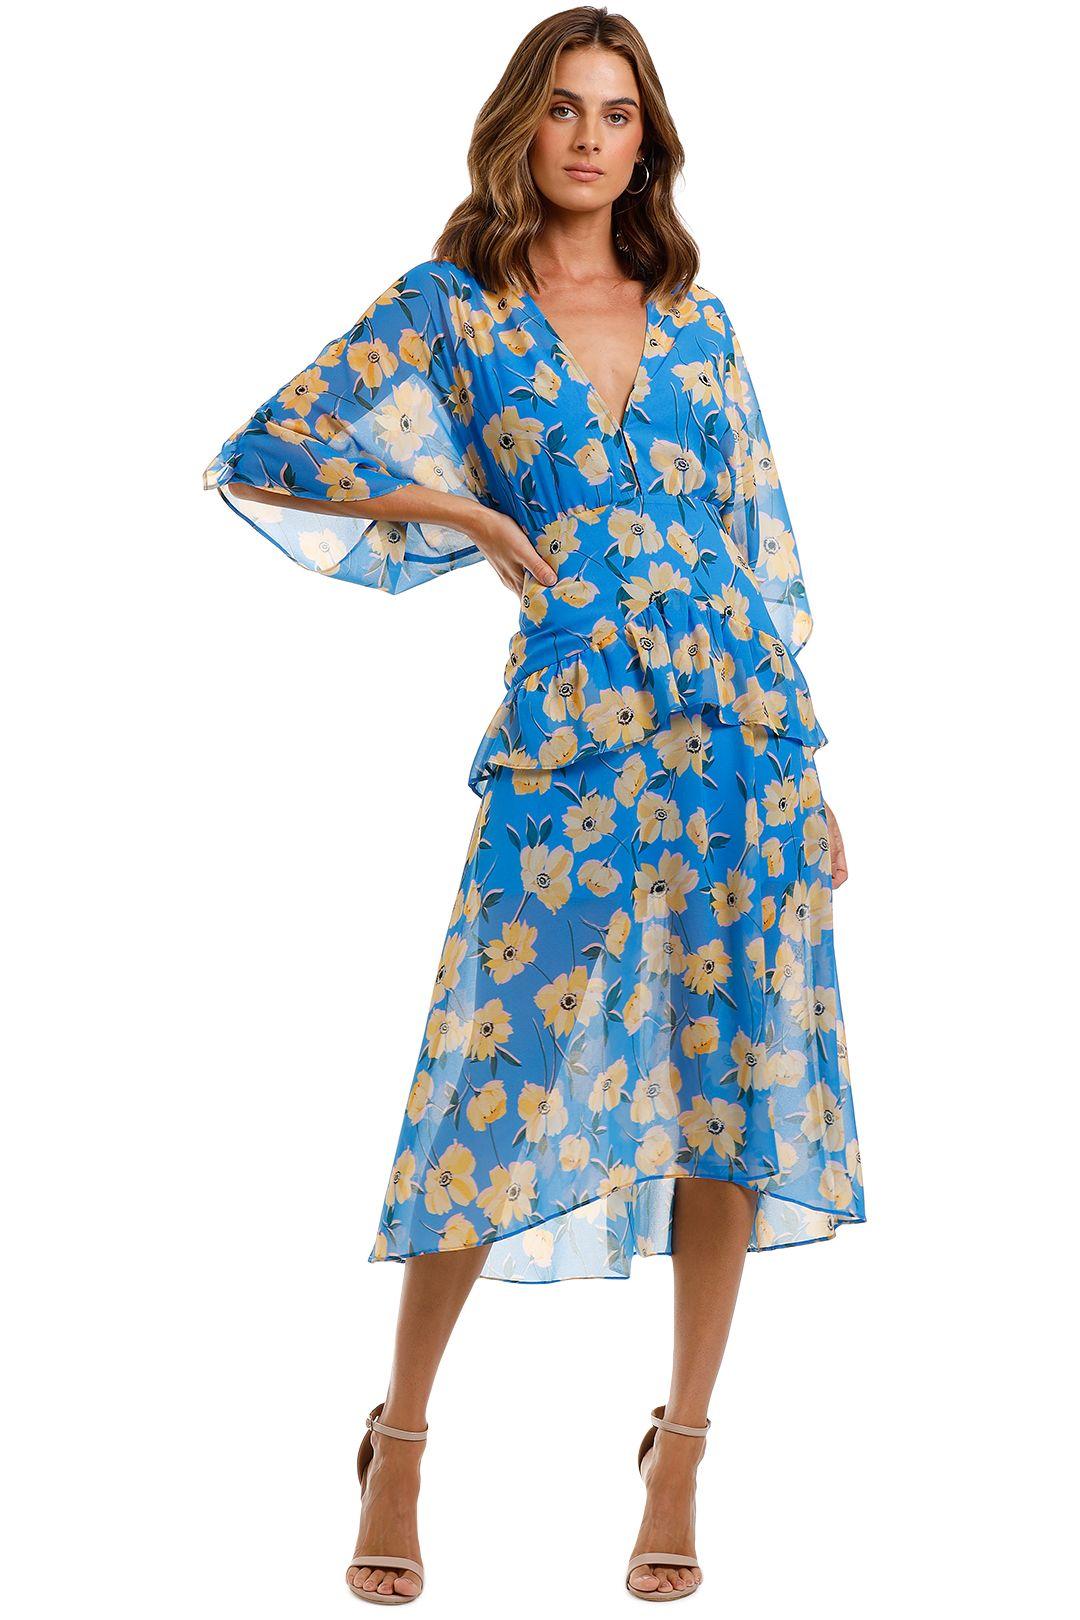 Talulah Sicily Sway Midi Dress floral long sleeve